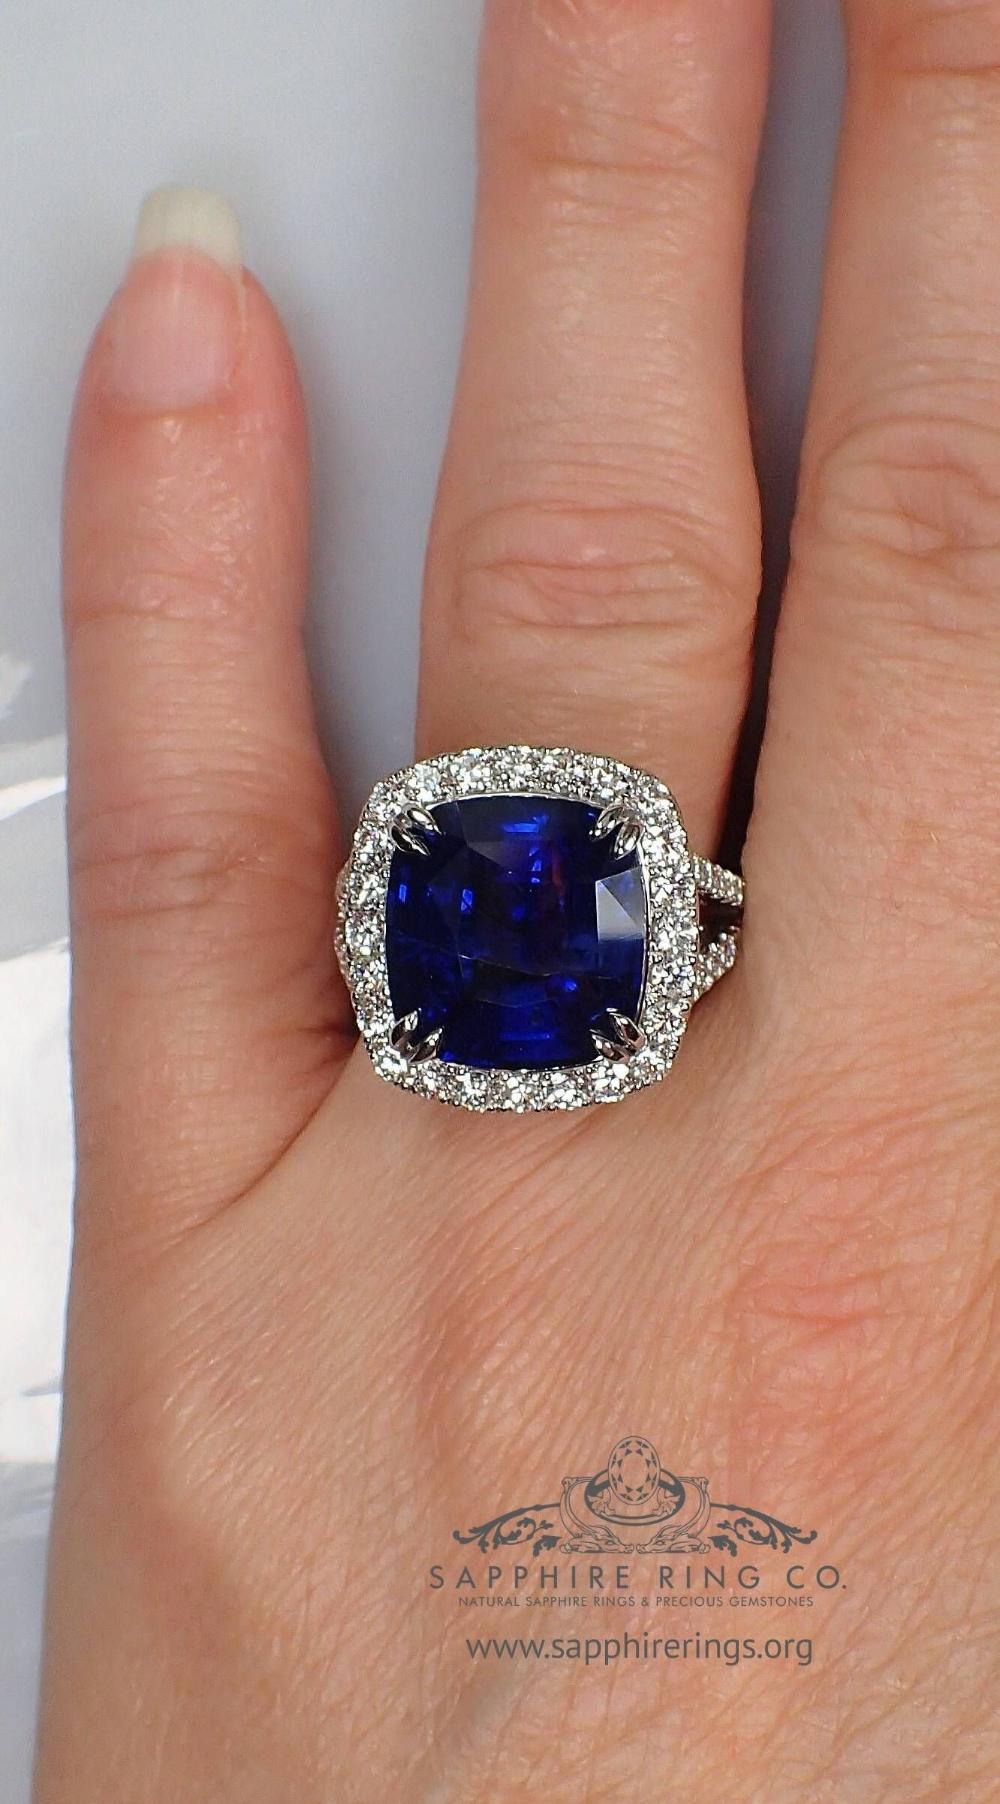 Platinum Natural Ceylon Sapphire Ring 10.51 ct GIA in